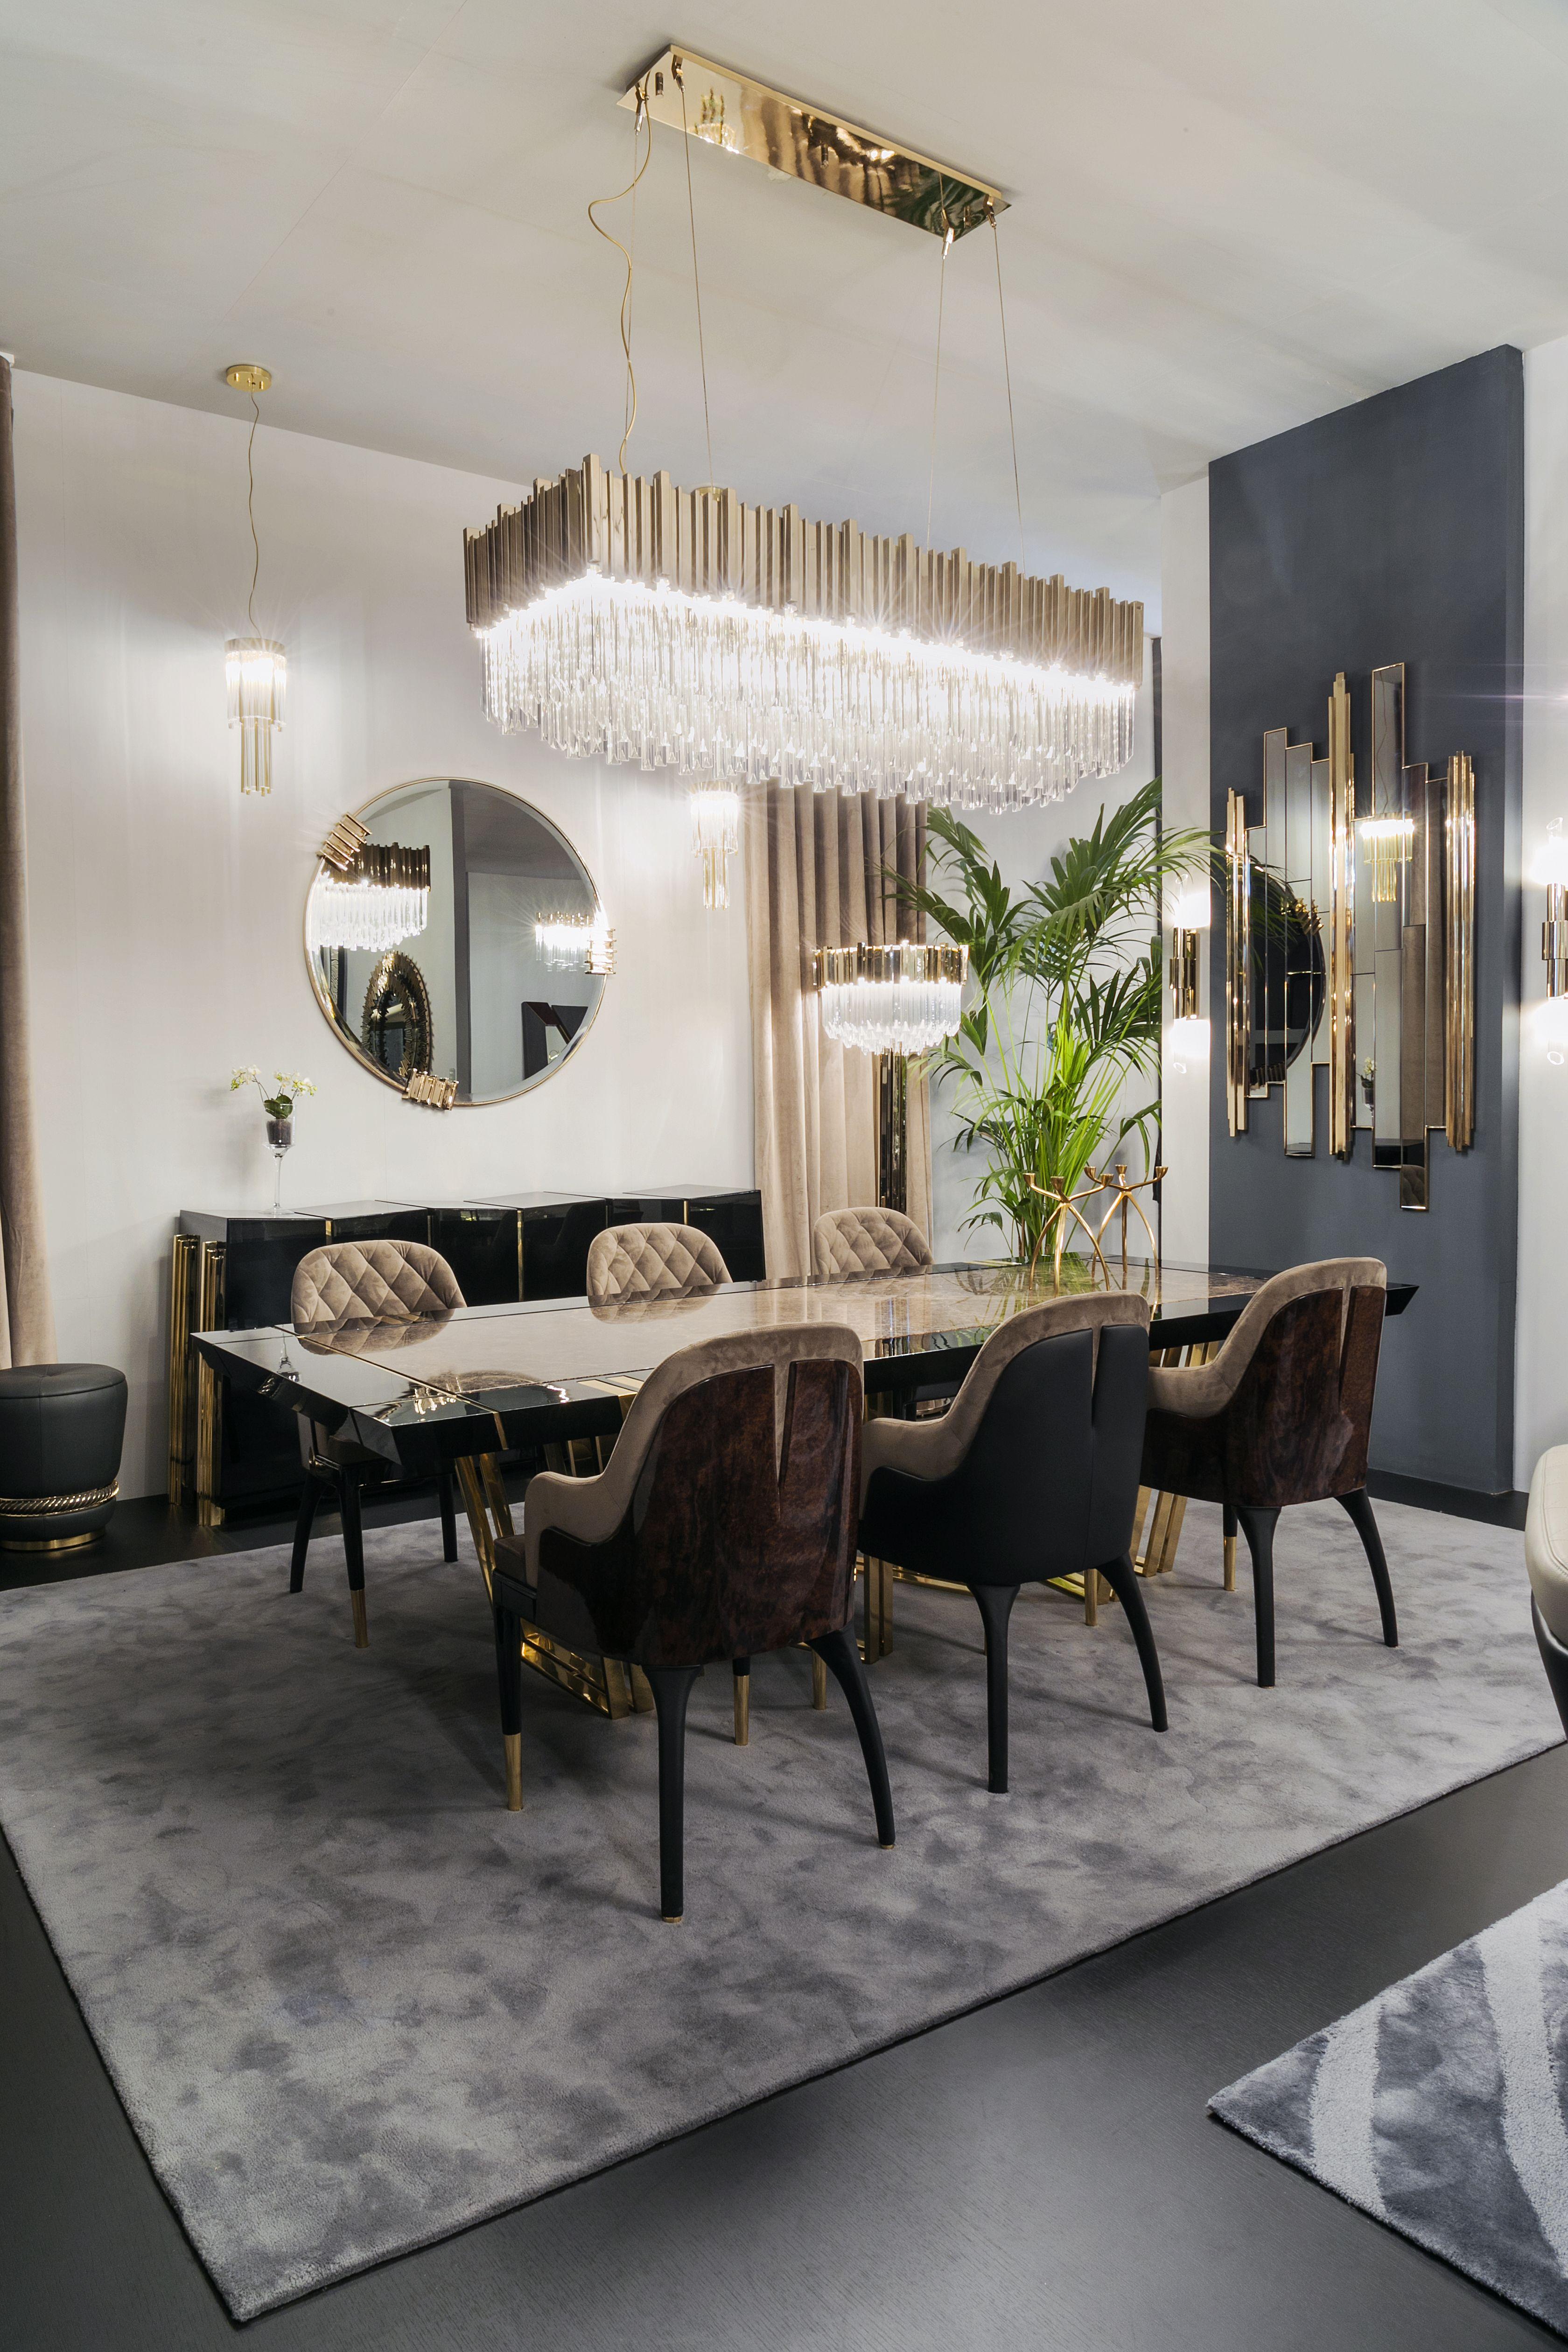 Classy Dining Room, Dining Room Furniture Ideas 2020